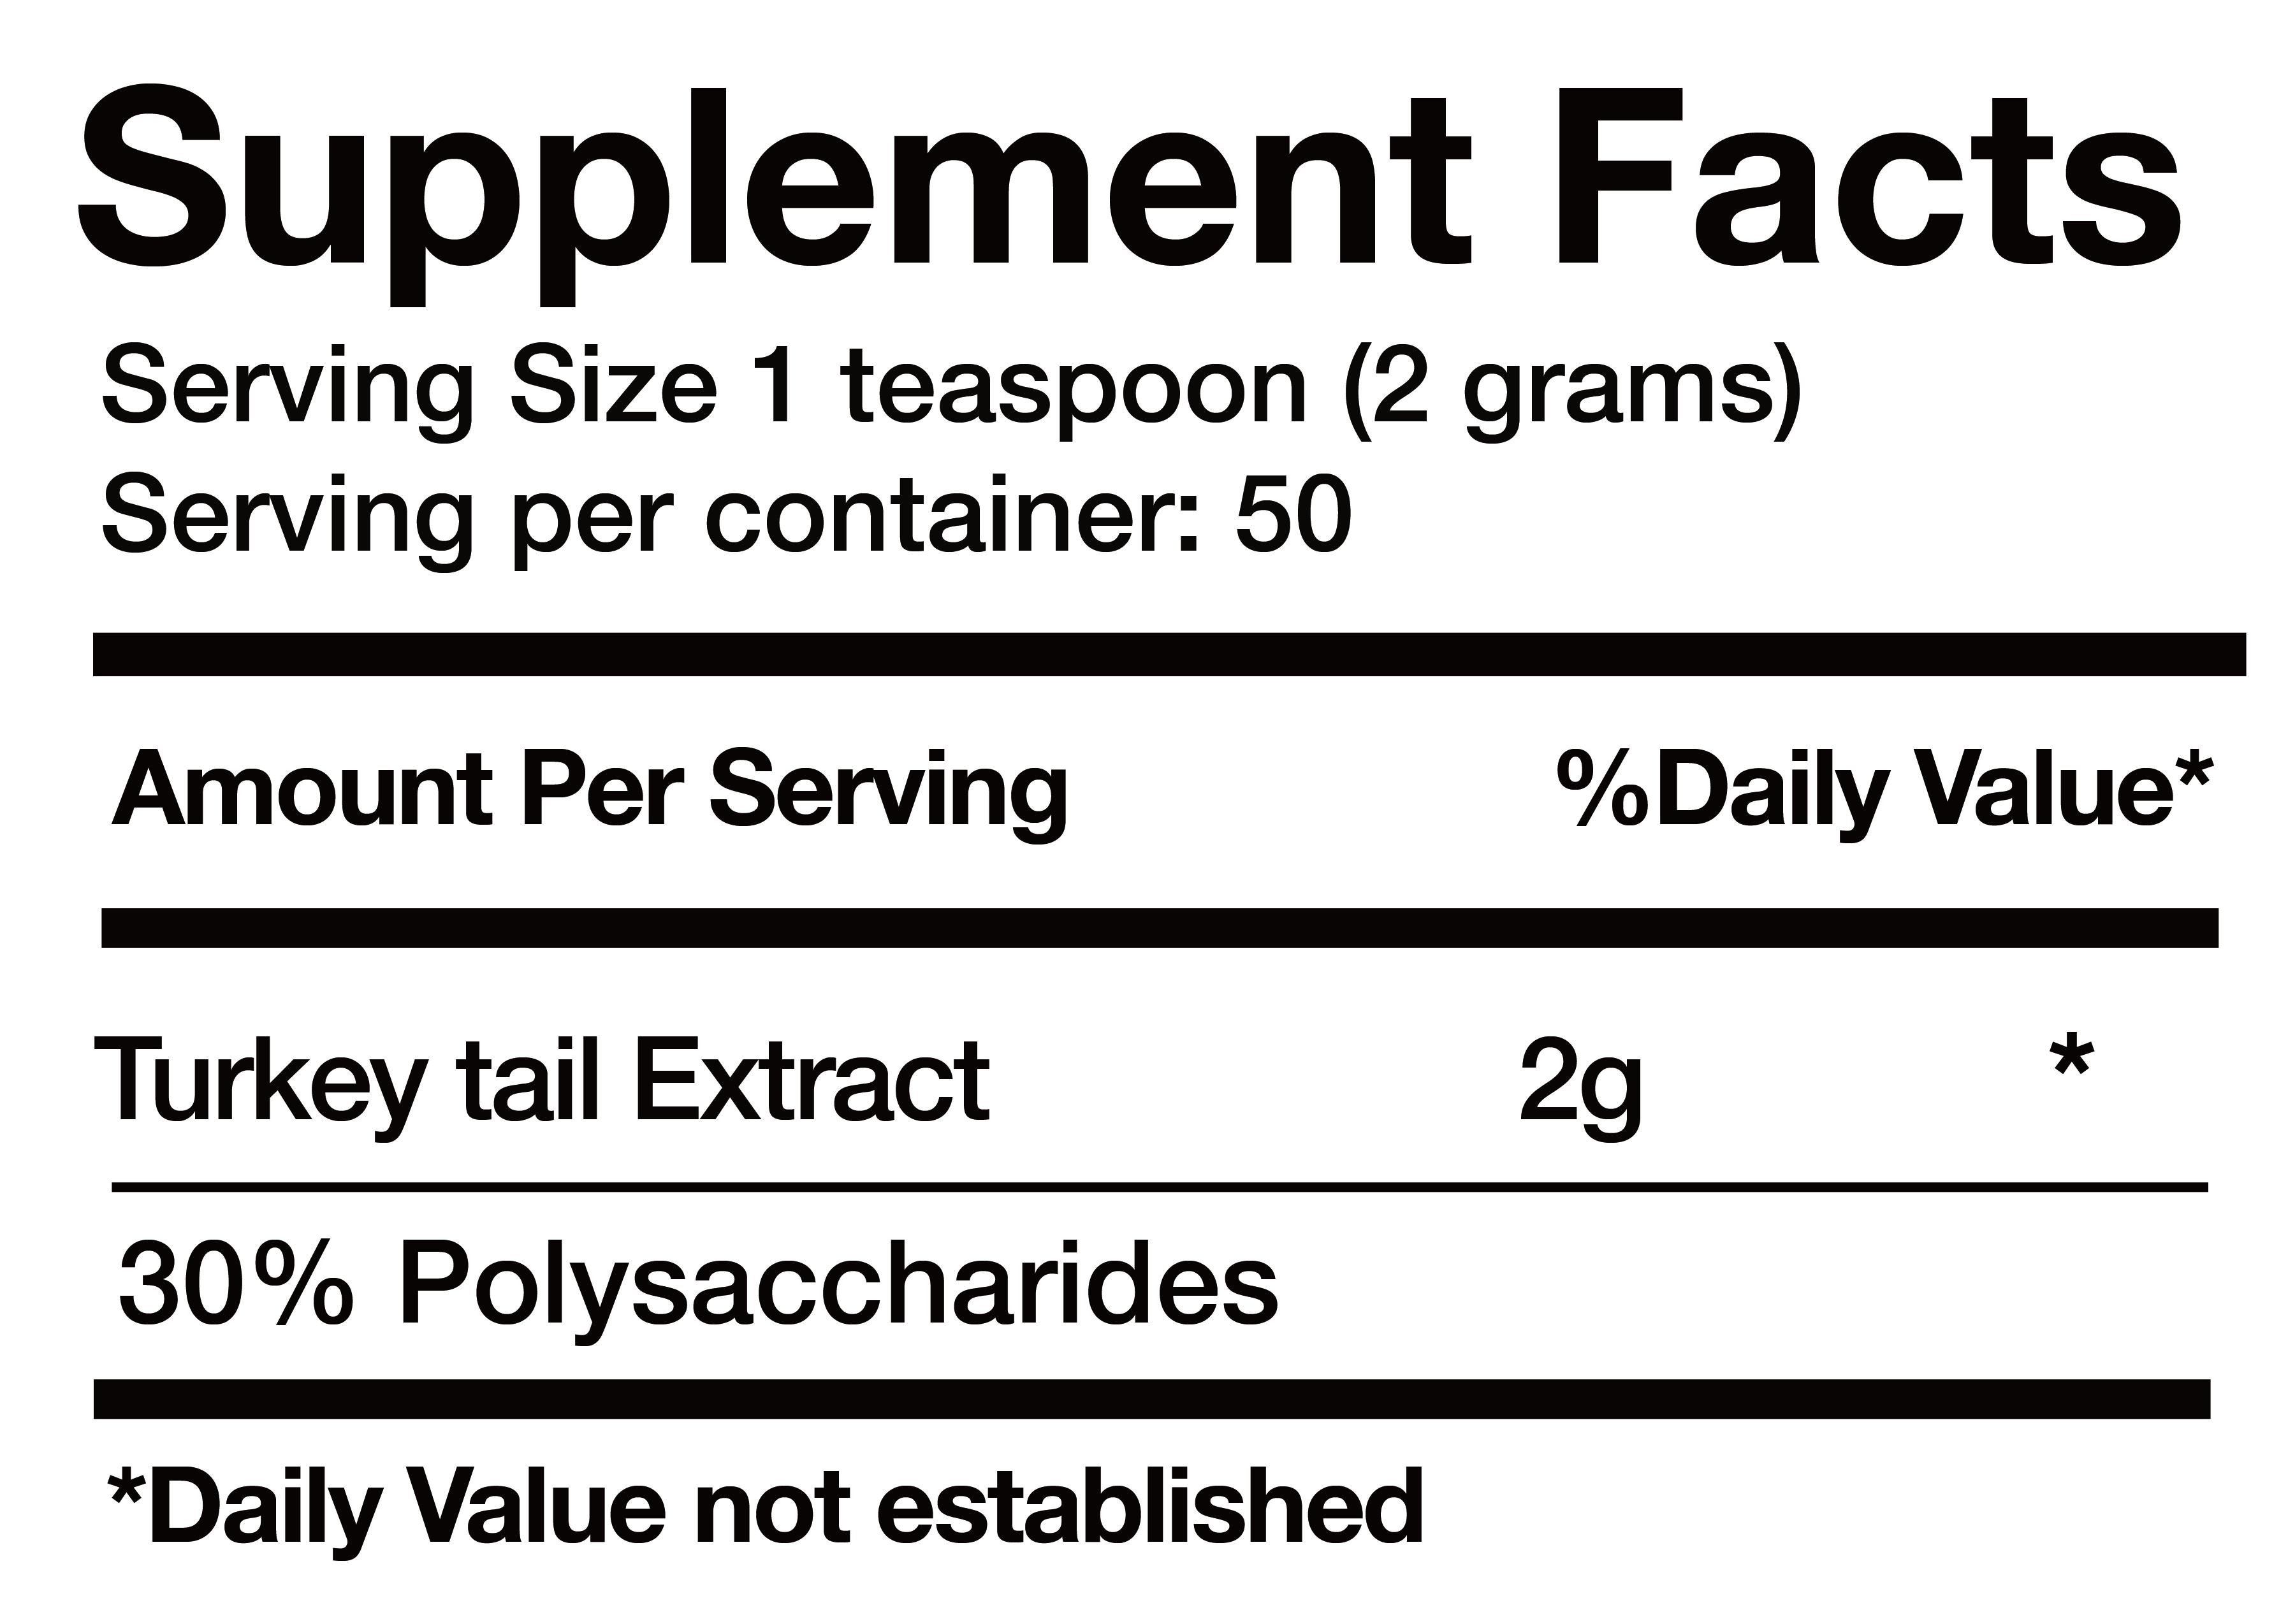 Extracto de Cola de Pavo (Turkey tail Extract) nutrition facts